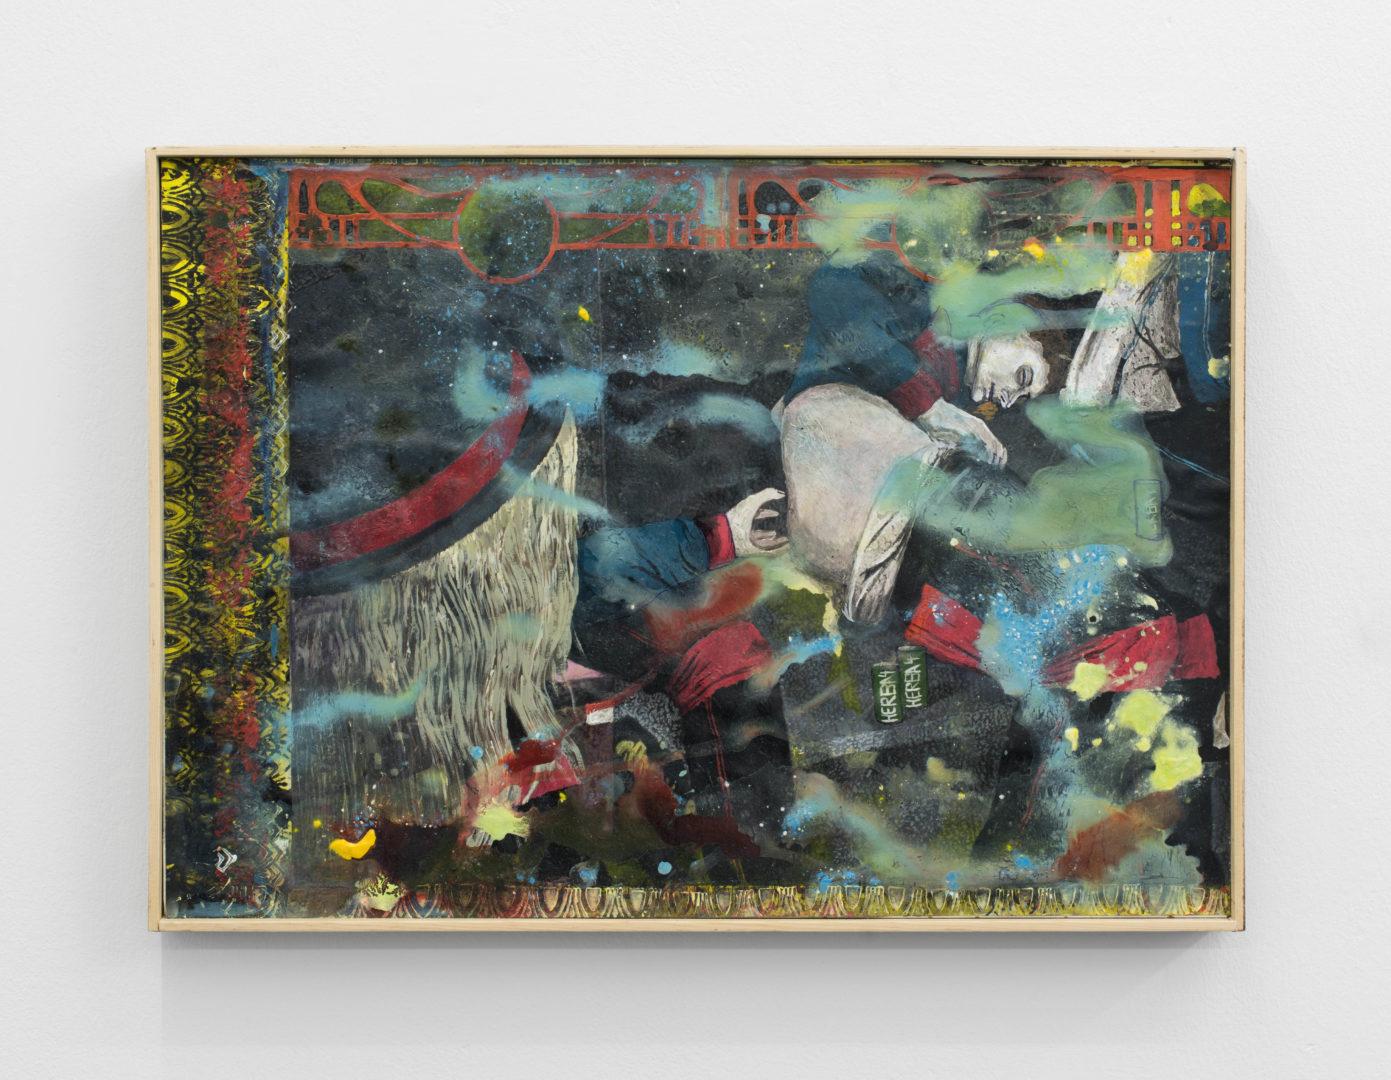 "Exhibition View Veit Laurent Kurz ""Selfless Devotion I (Herba-4 Series), 2017"" at Weiss Falk / Courtesy: Weiss Falk and the artist"